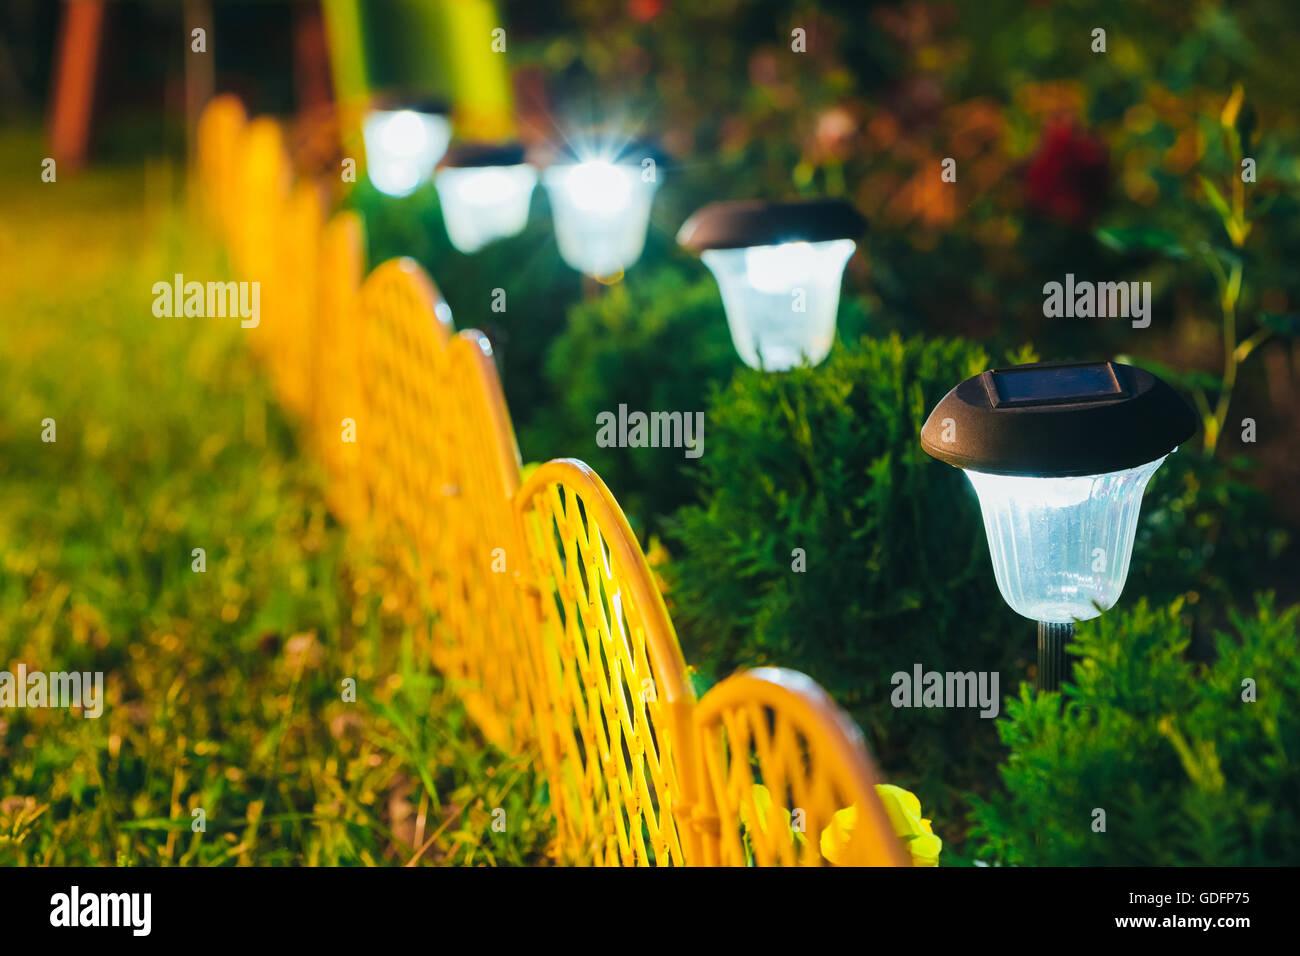 Excellent Solar Garden Decorations Photos - Beautiful Garden - dlix.us